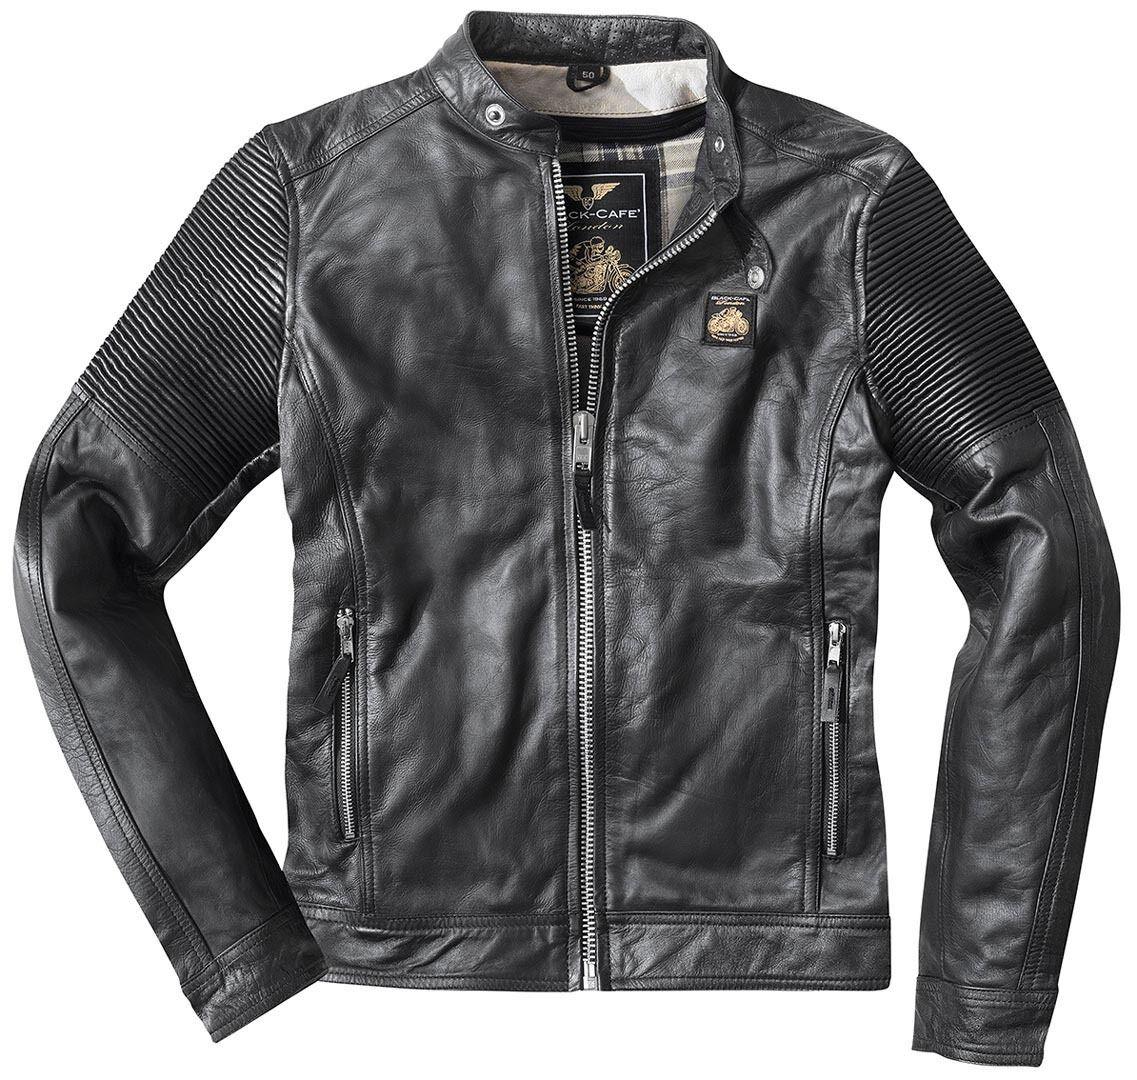 Black-Cafe London Milano Veste en cuir de moto Noir taille : 58